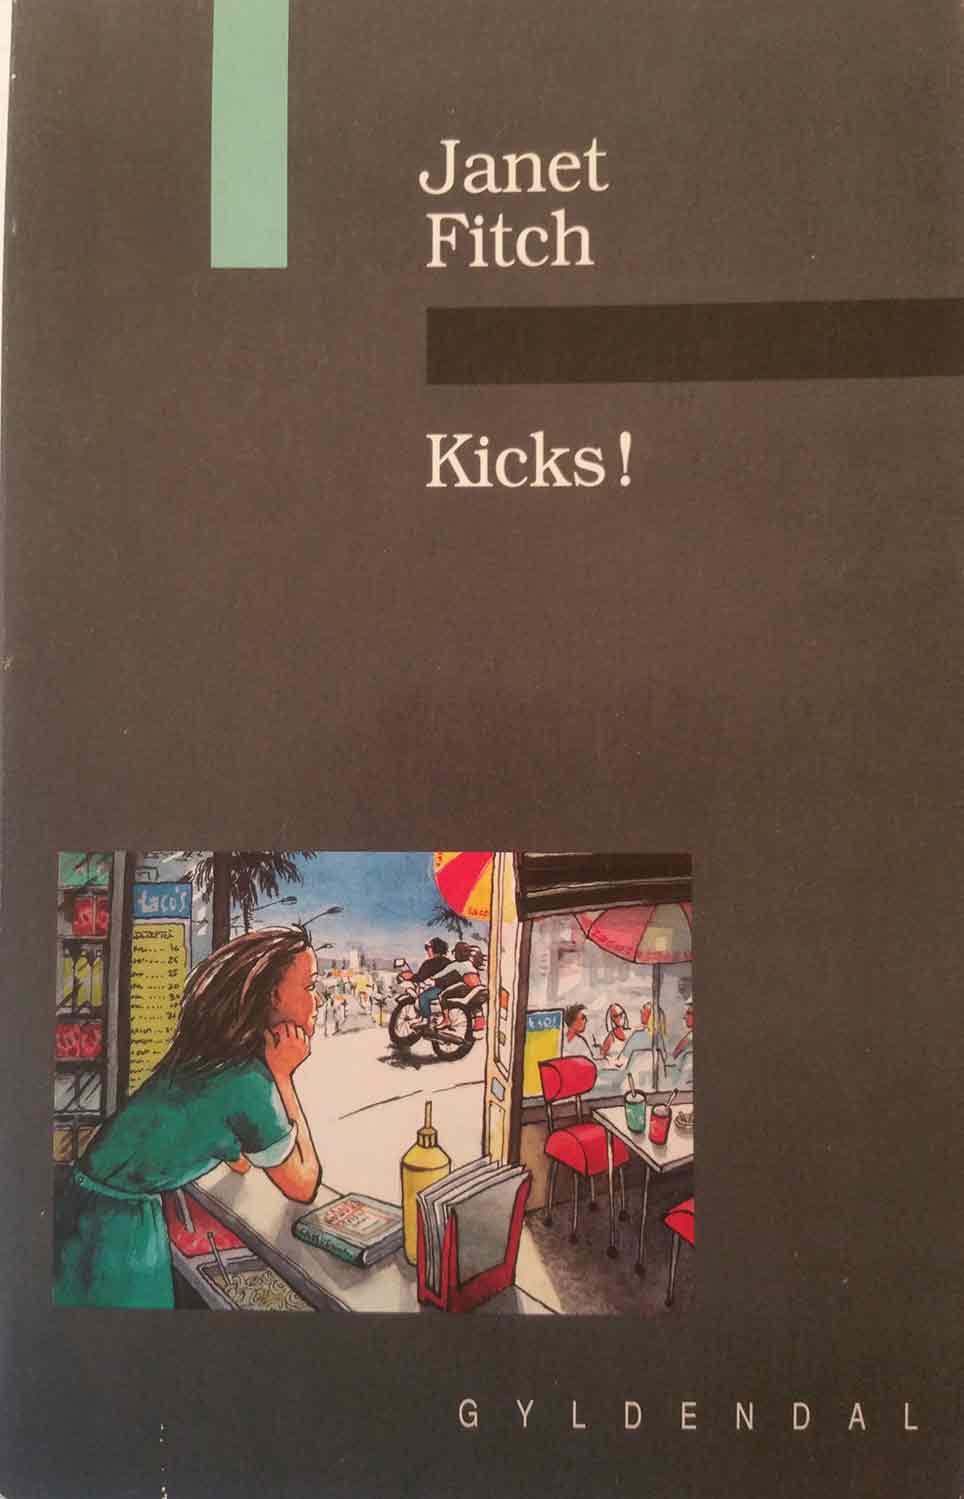 Danish edition, Glydendal, 1995